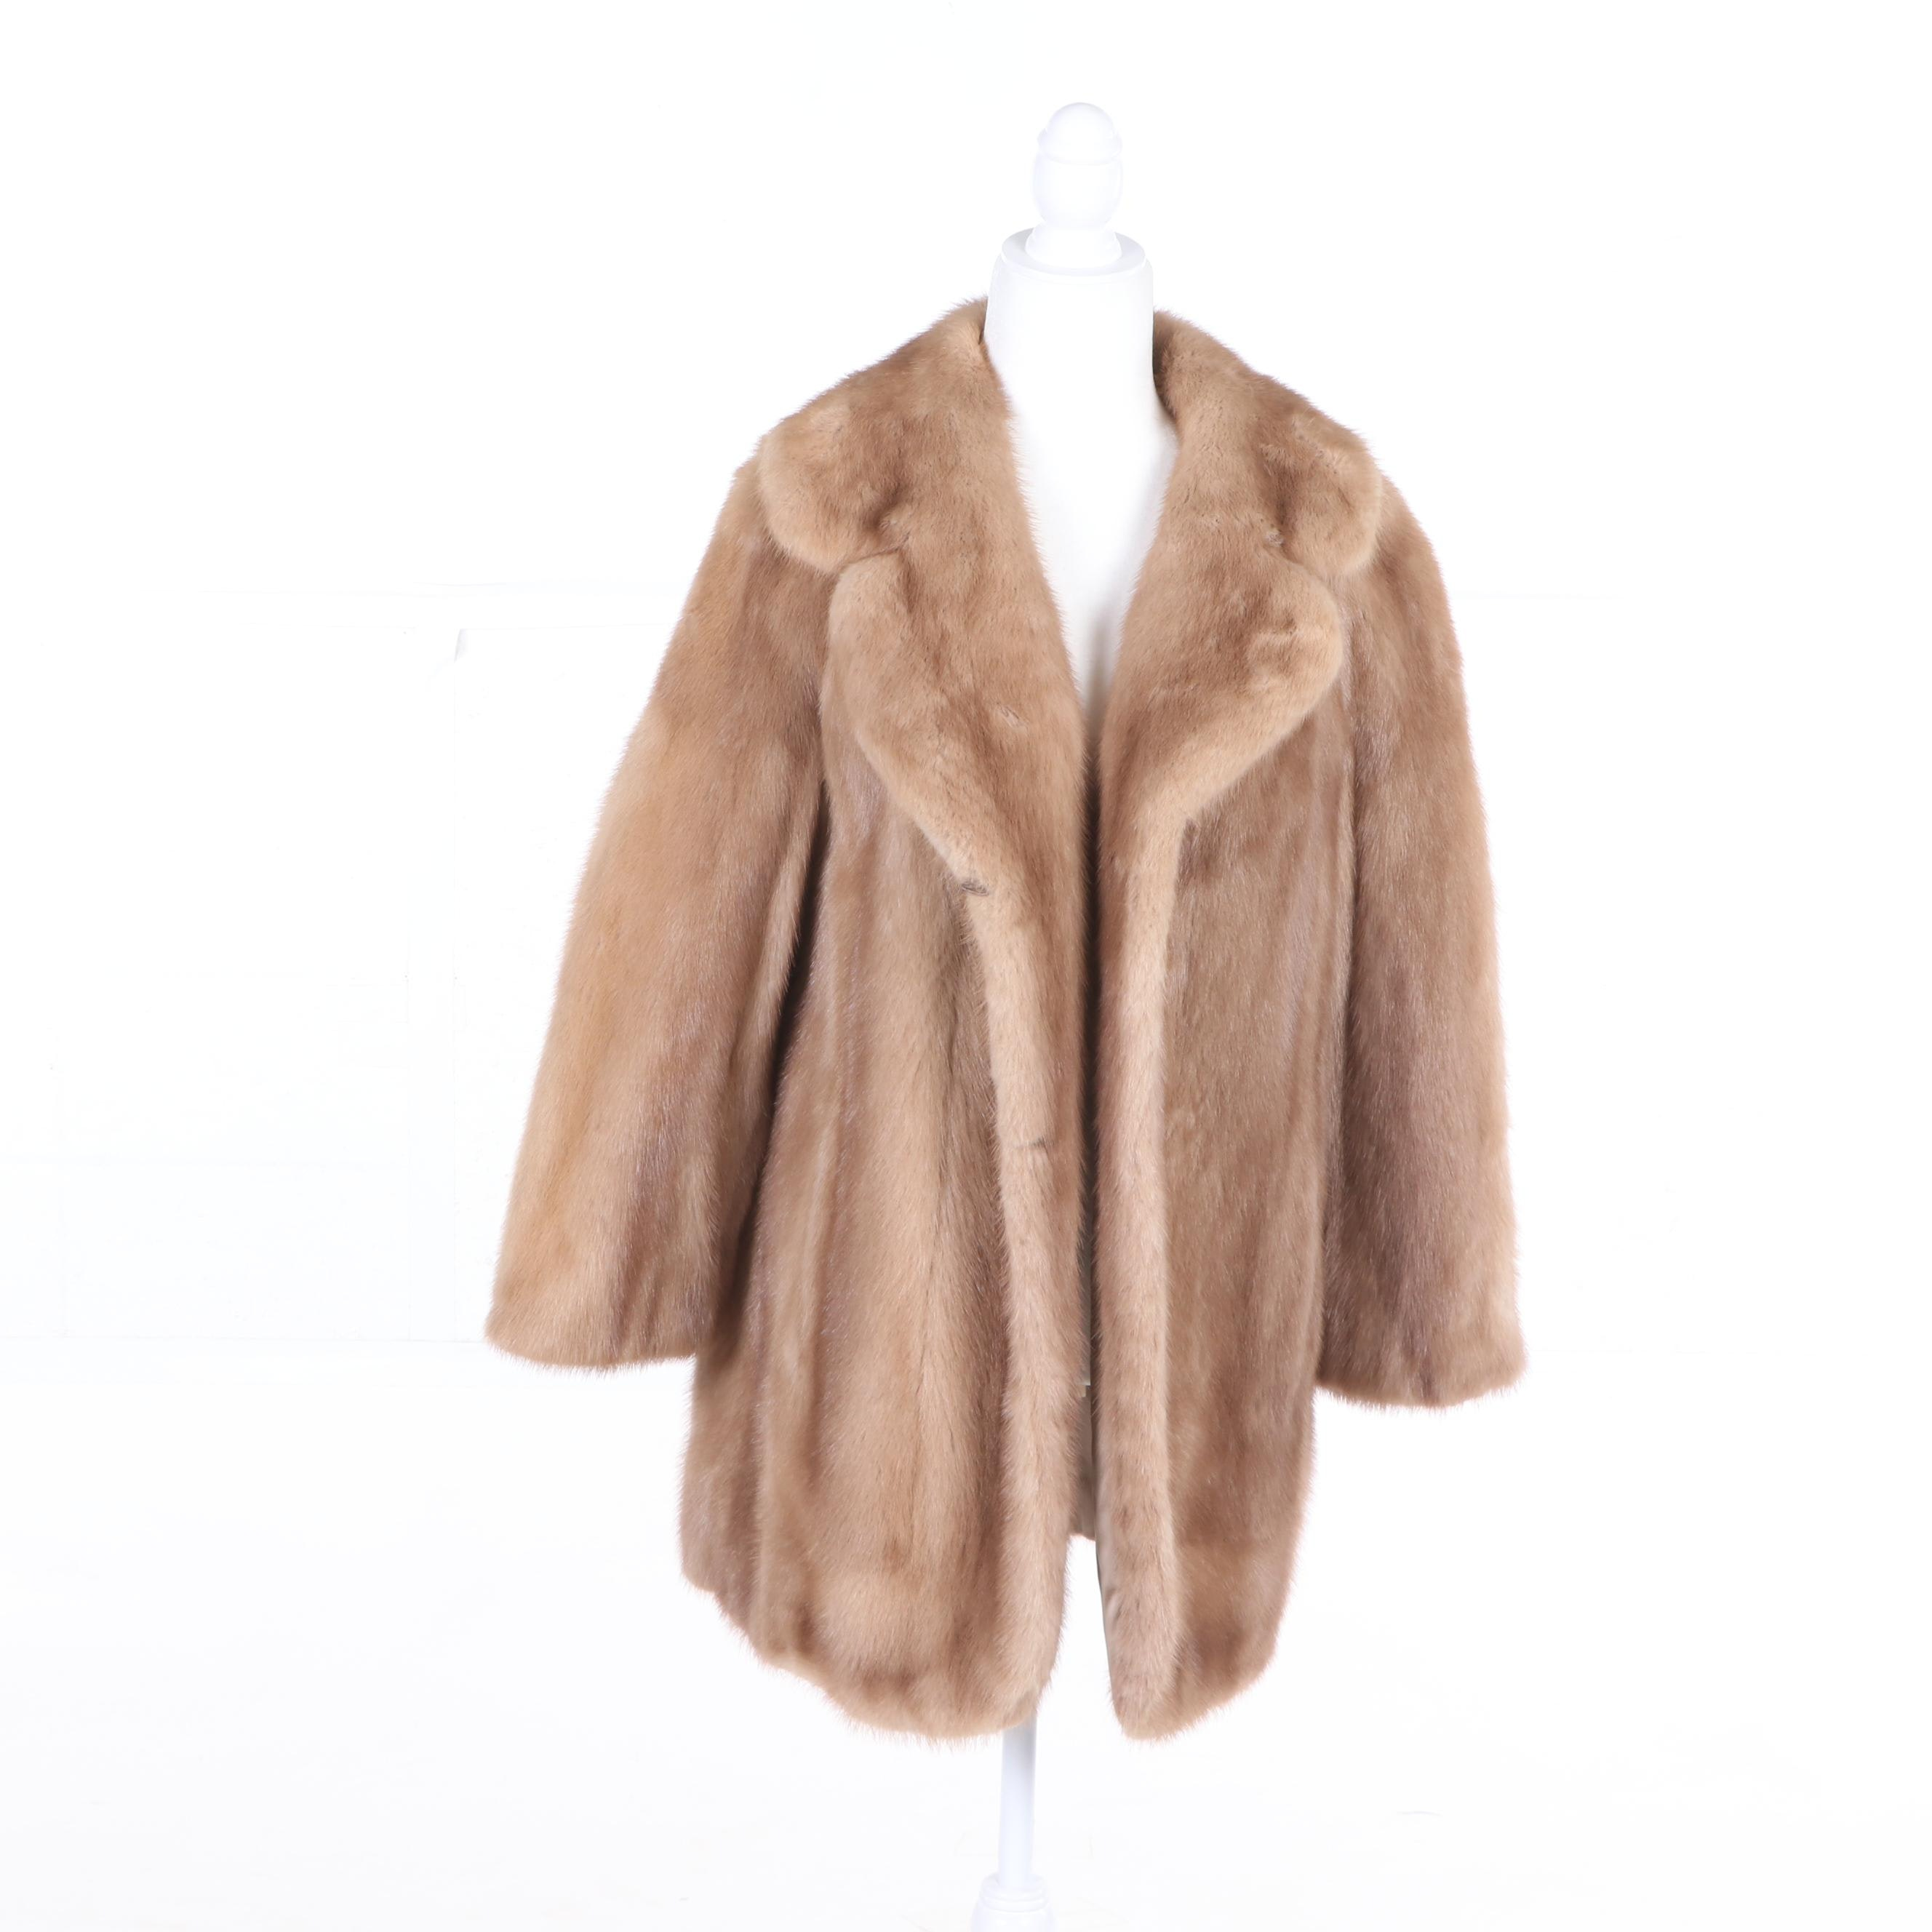 Women's Evans Furs Mink Fur Coat, Vintage